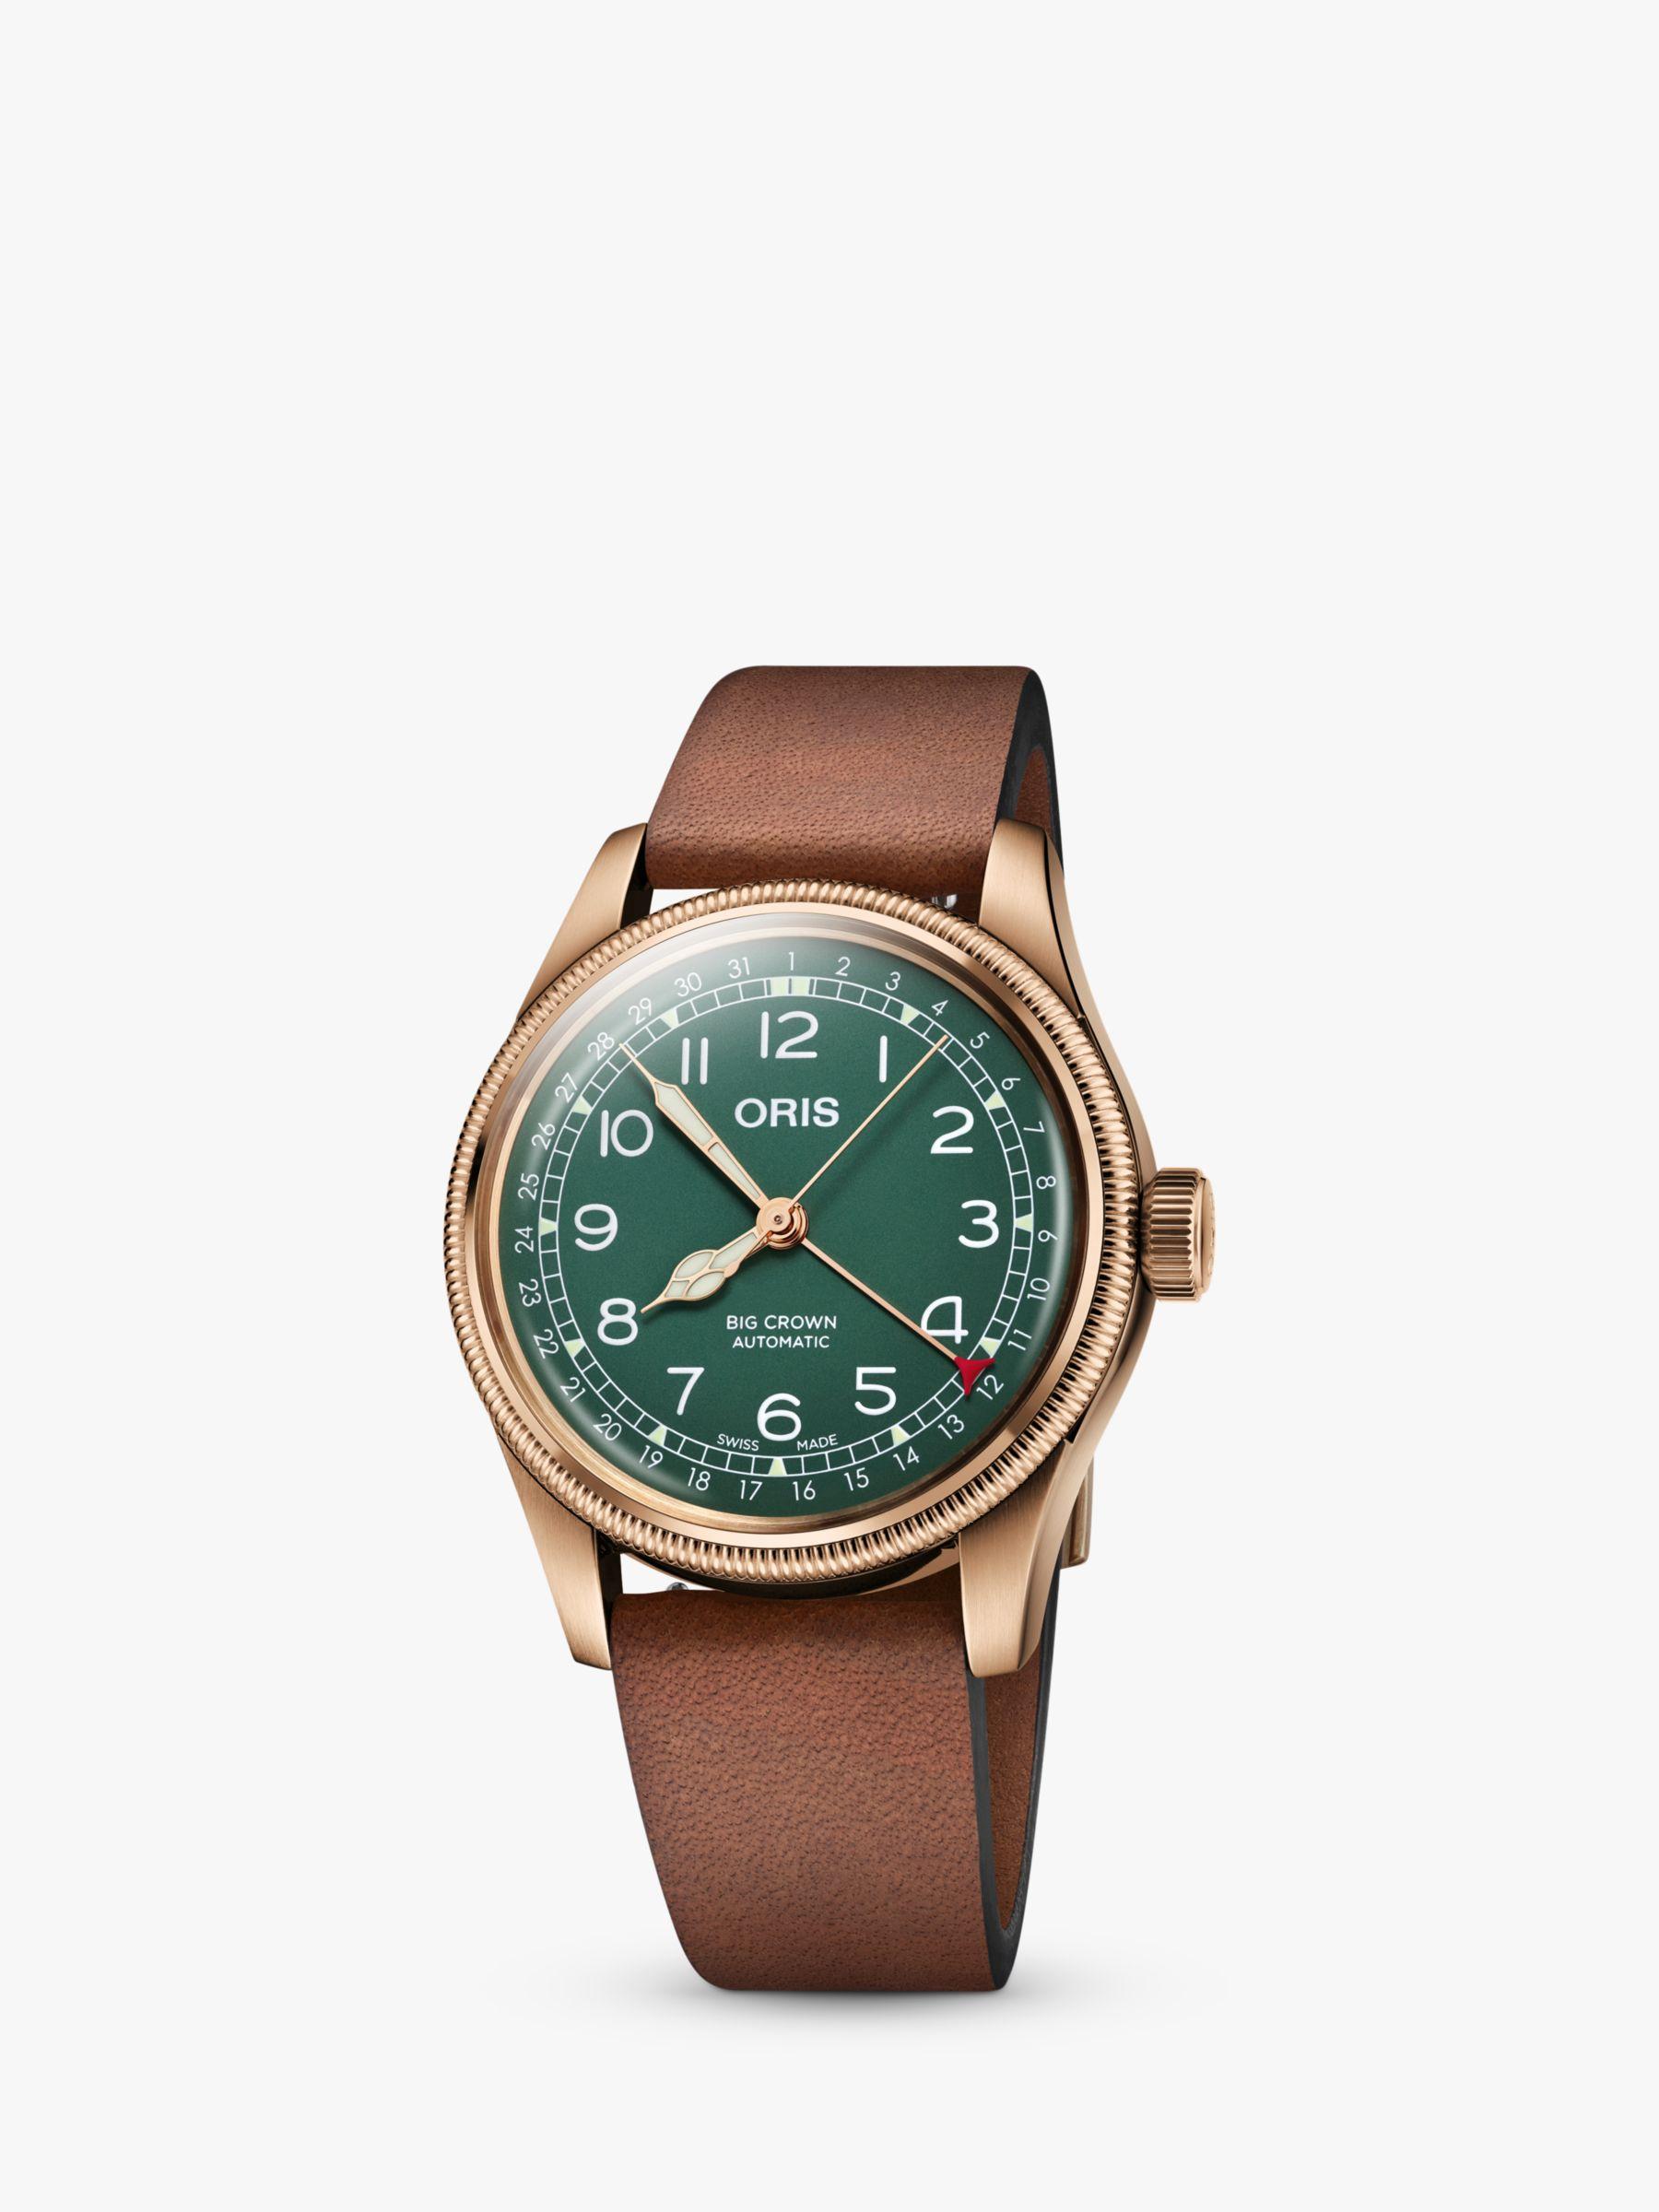 Oris Oris 01 754 7741 3167-07 5 20 58BR Men's Big Crown Pointer Date 80th Anniversary Leather Strap Watch, Brown/Green